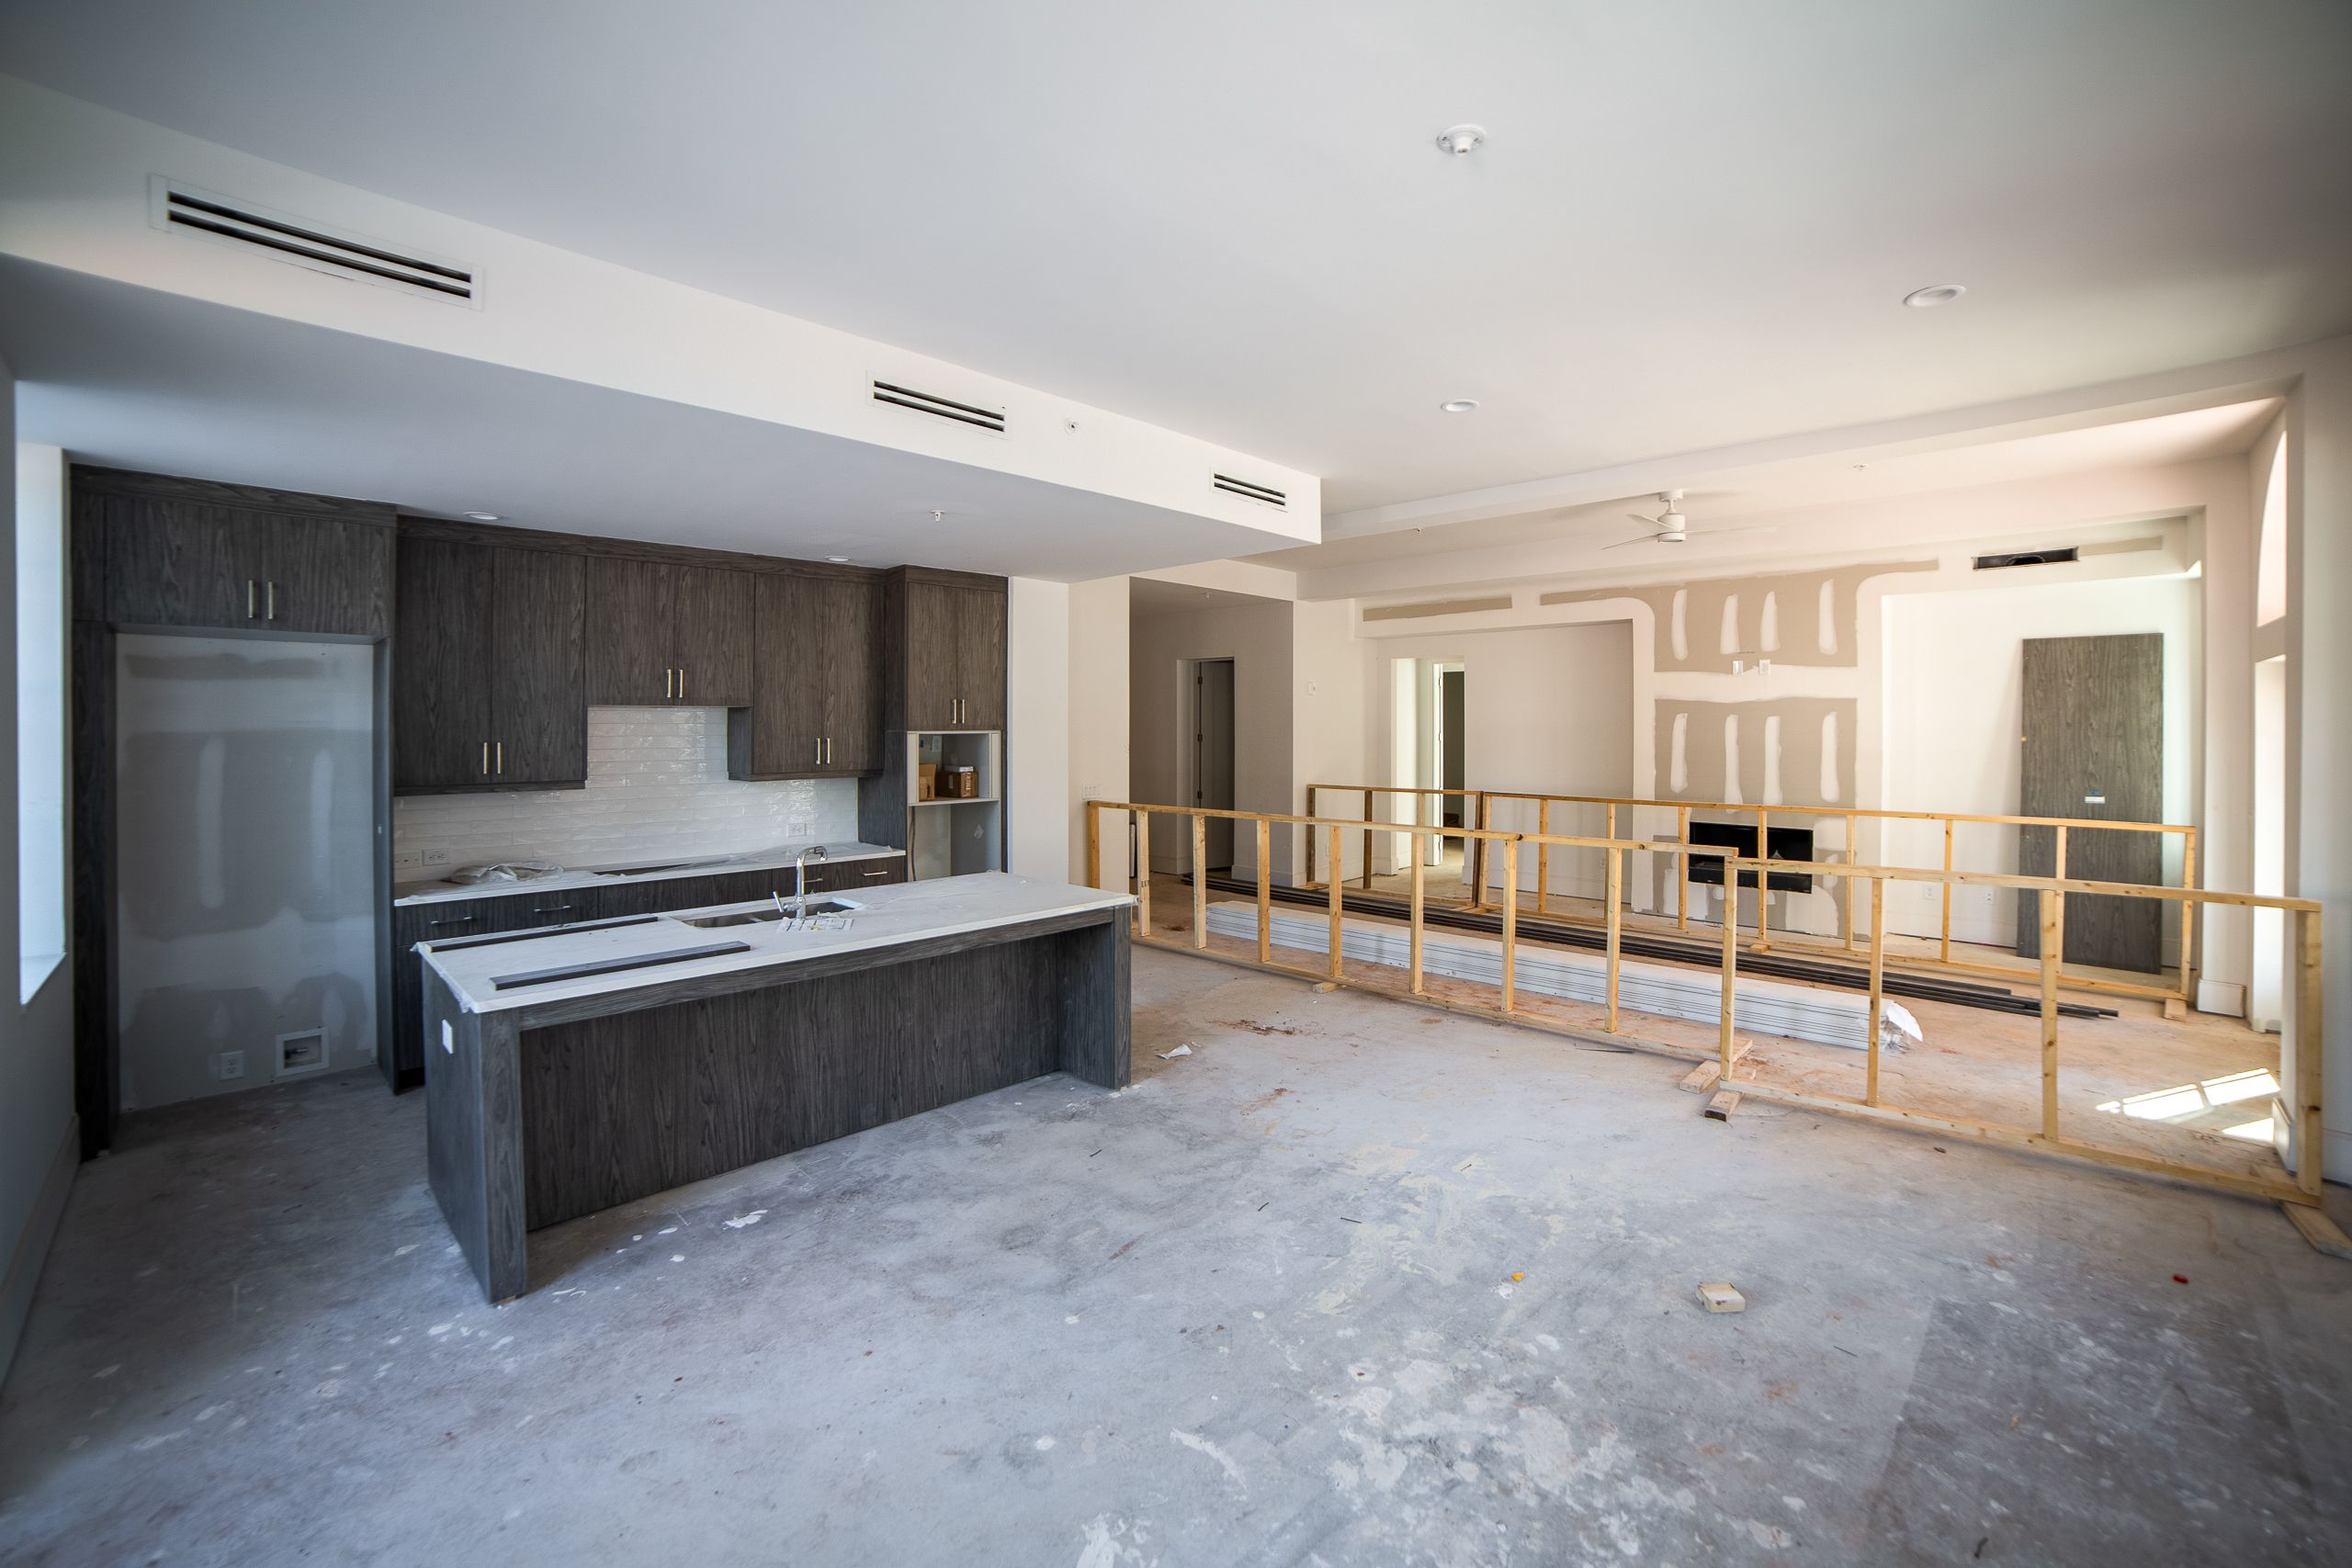 Kitchen featured in the Briarcliff Condo By Minerva Homes in Atlanta, GA